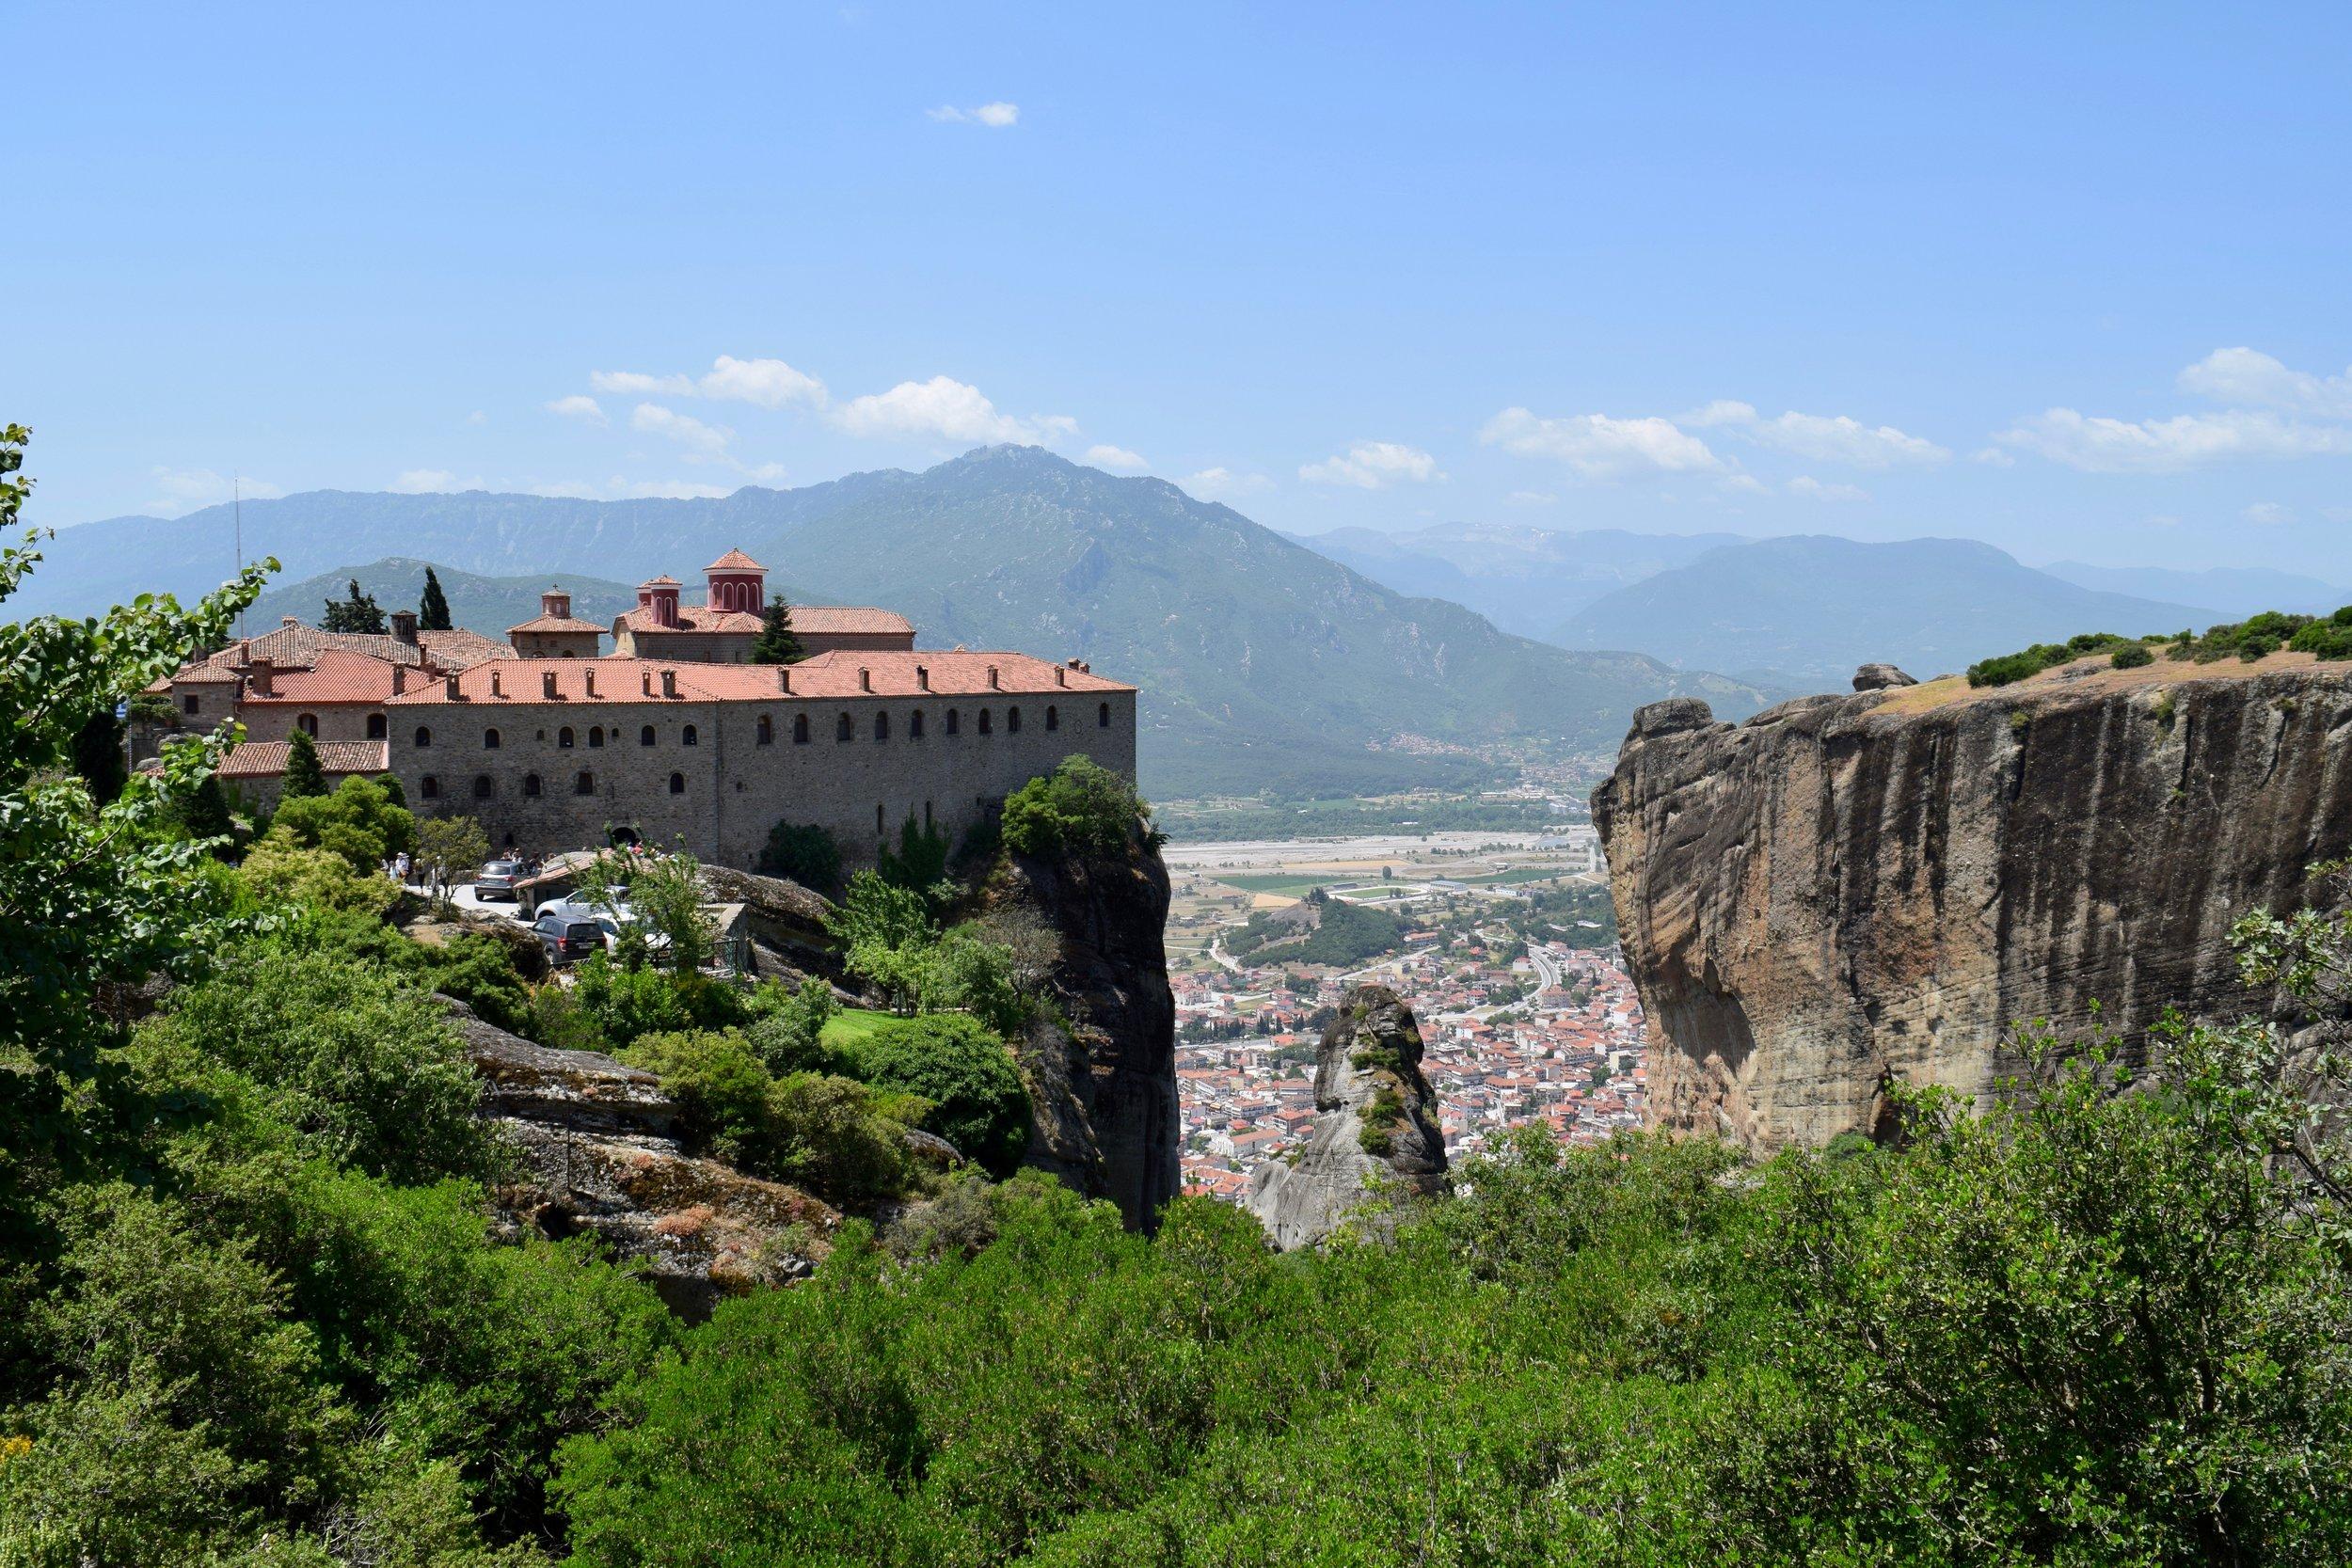 St. Stefanos Monastery